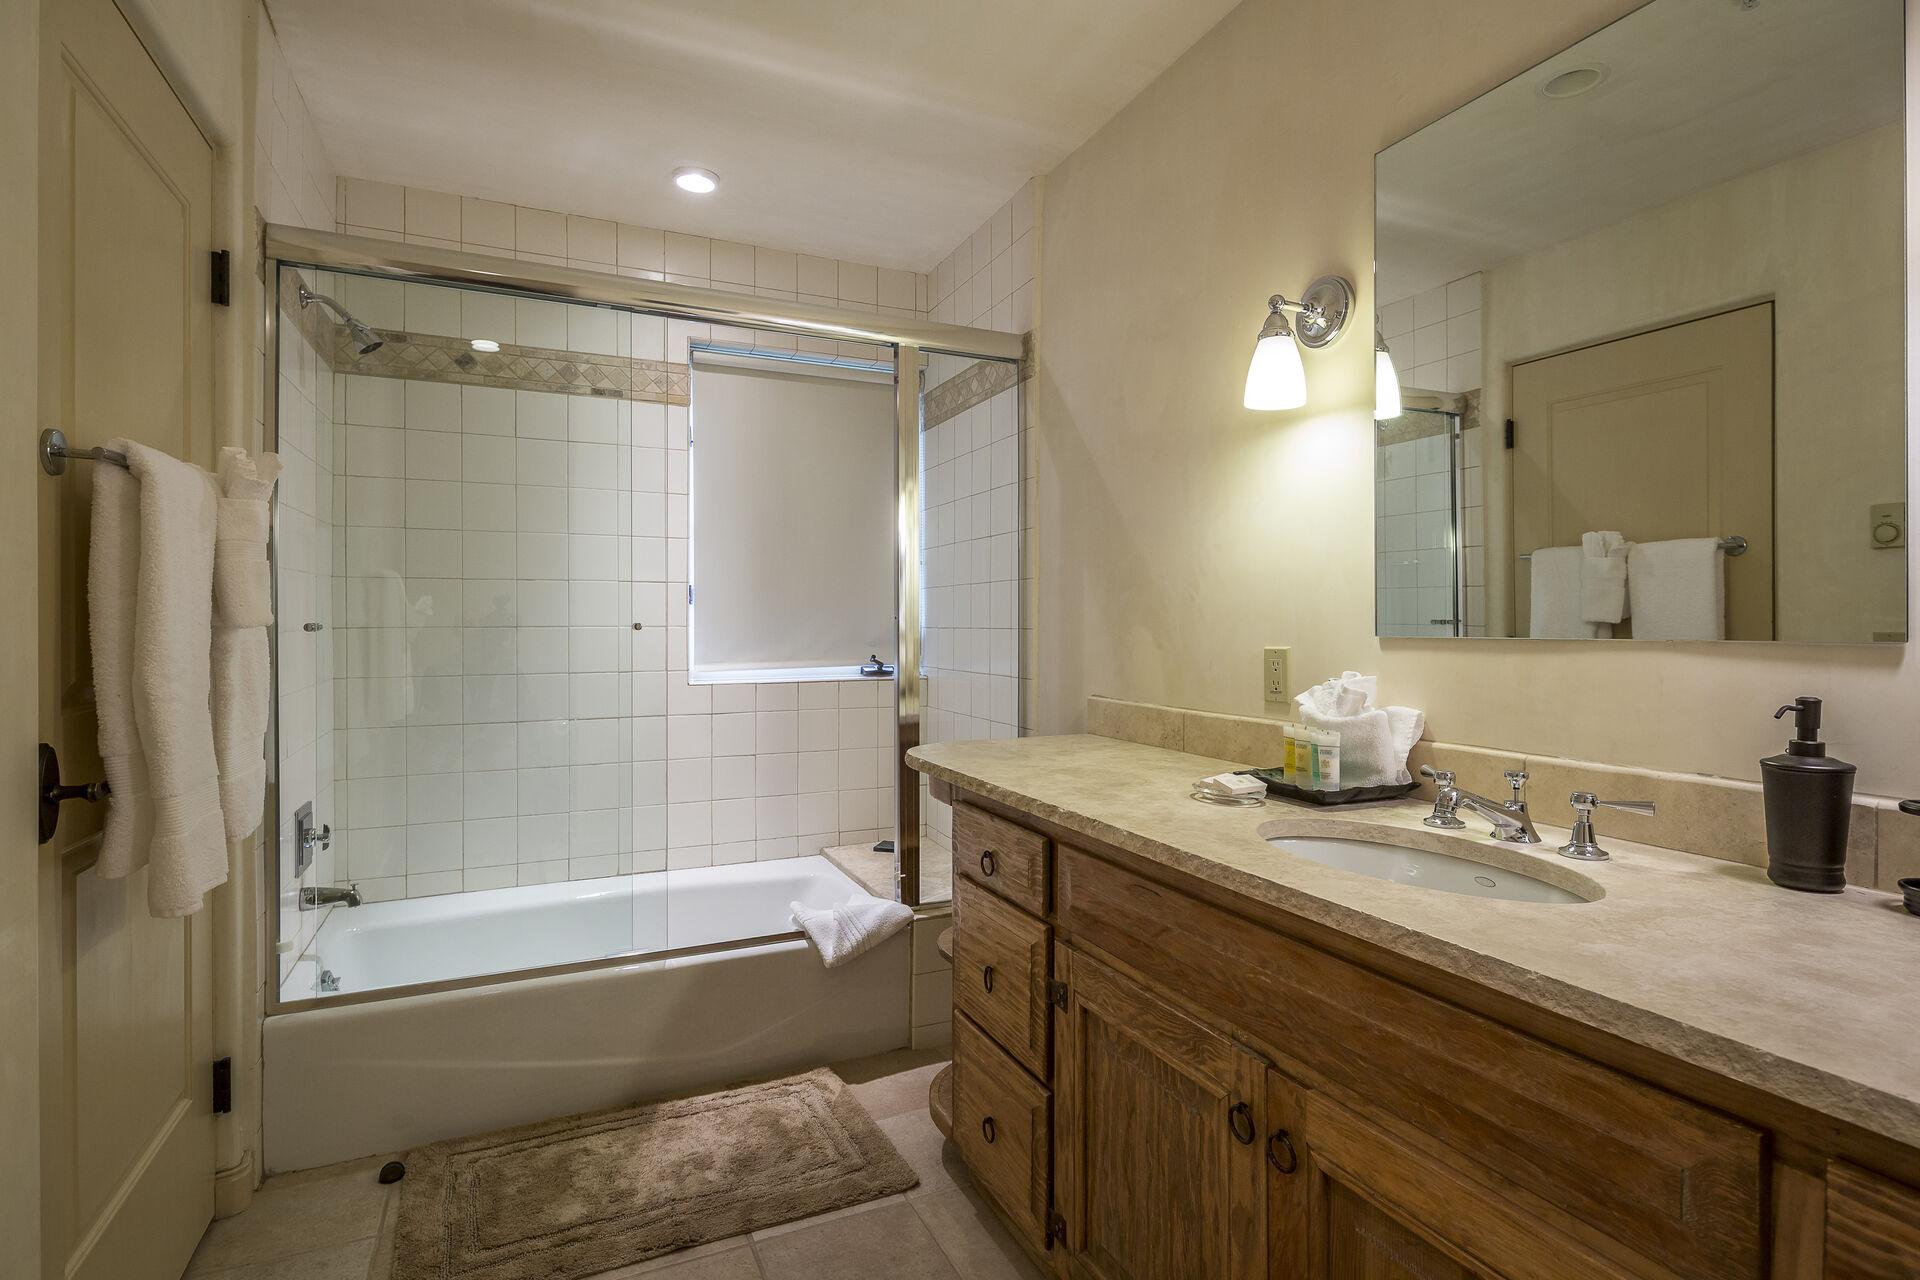 The glass-door shower of this bathroom is individual lit, as is the vanity sink.